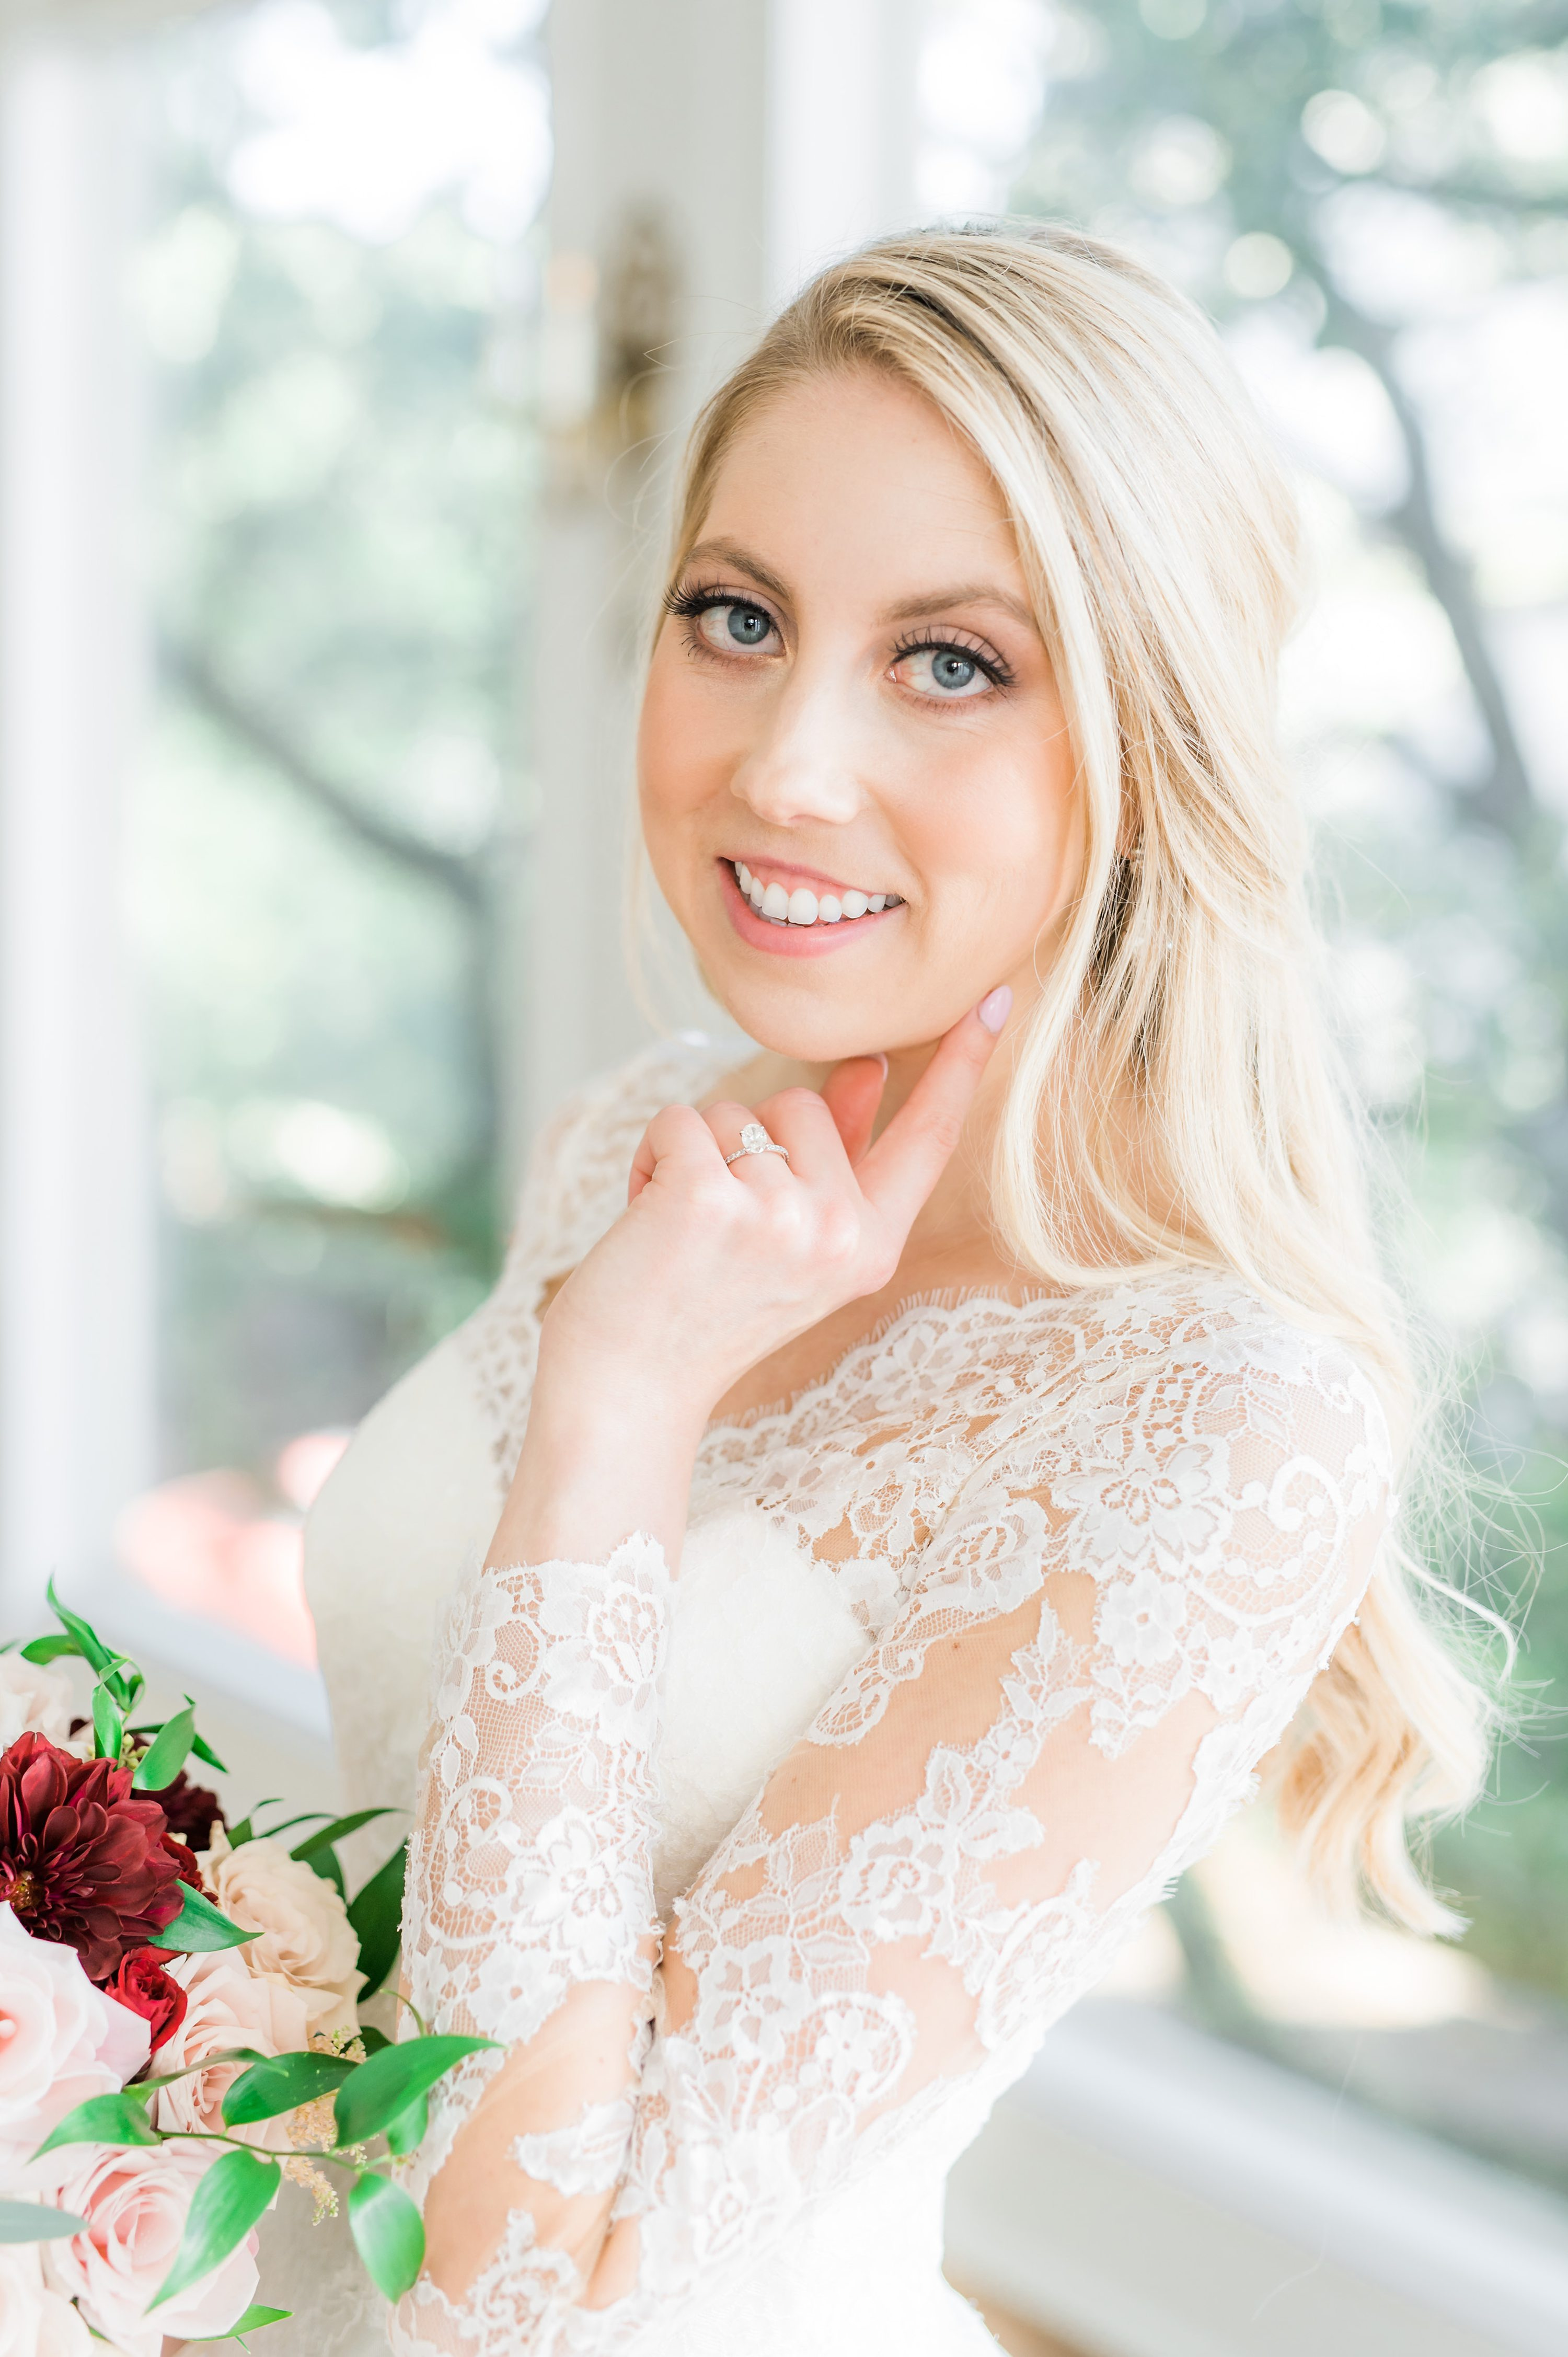 Houston Wedding,Houston Wedding Photographer